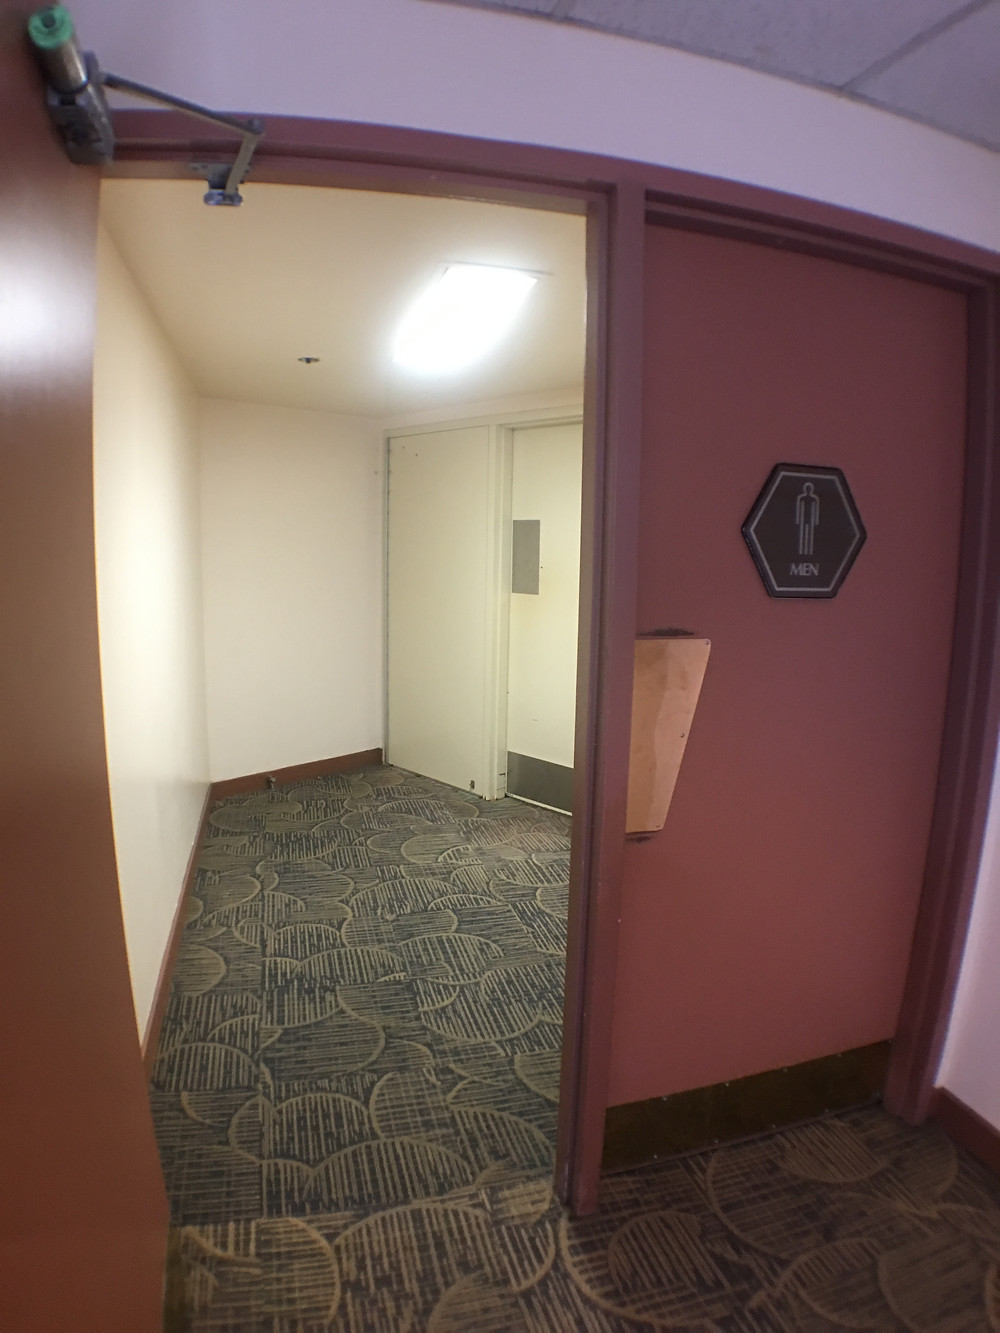 Entrance to Men's Restroom Odyssey Center Epcot